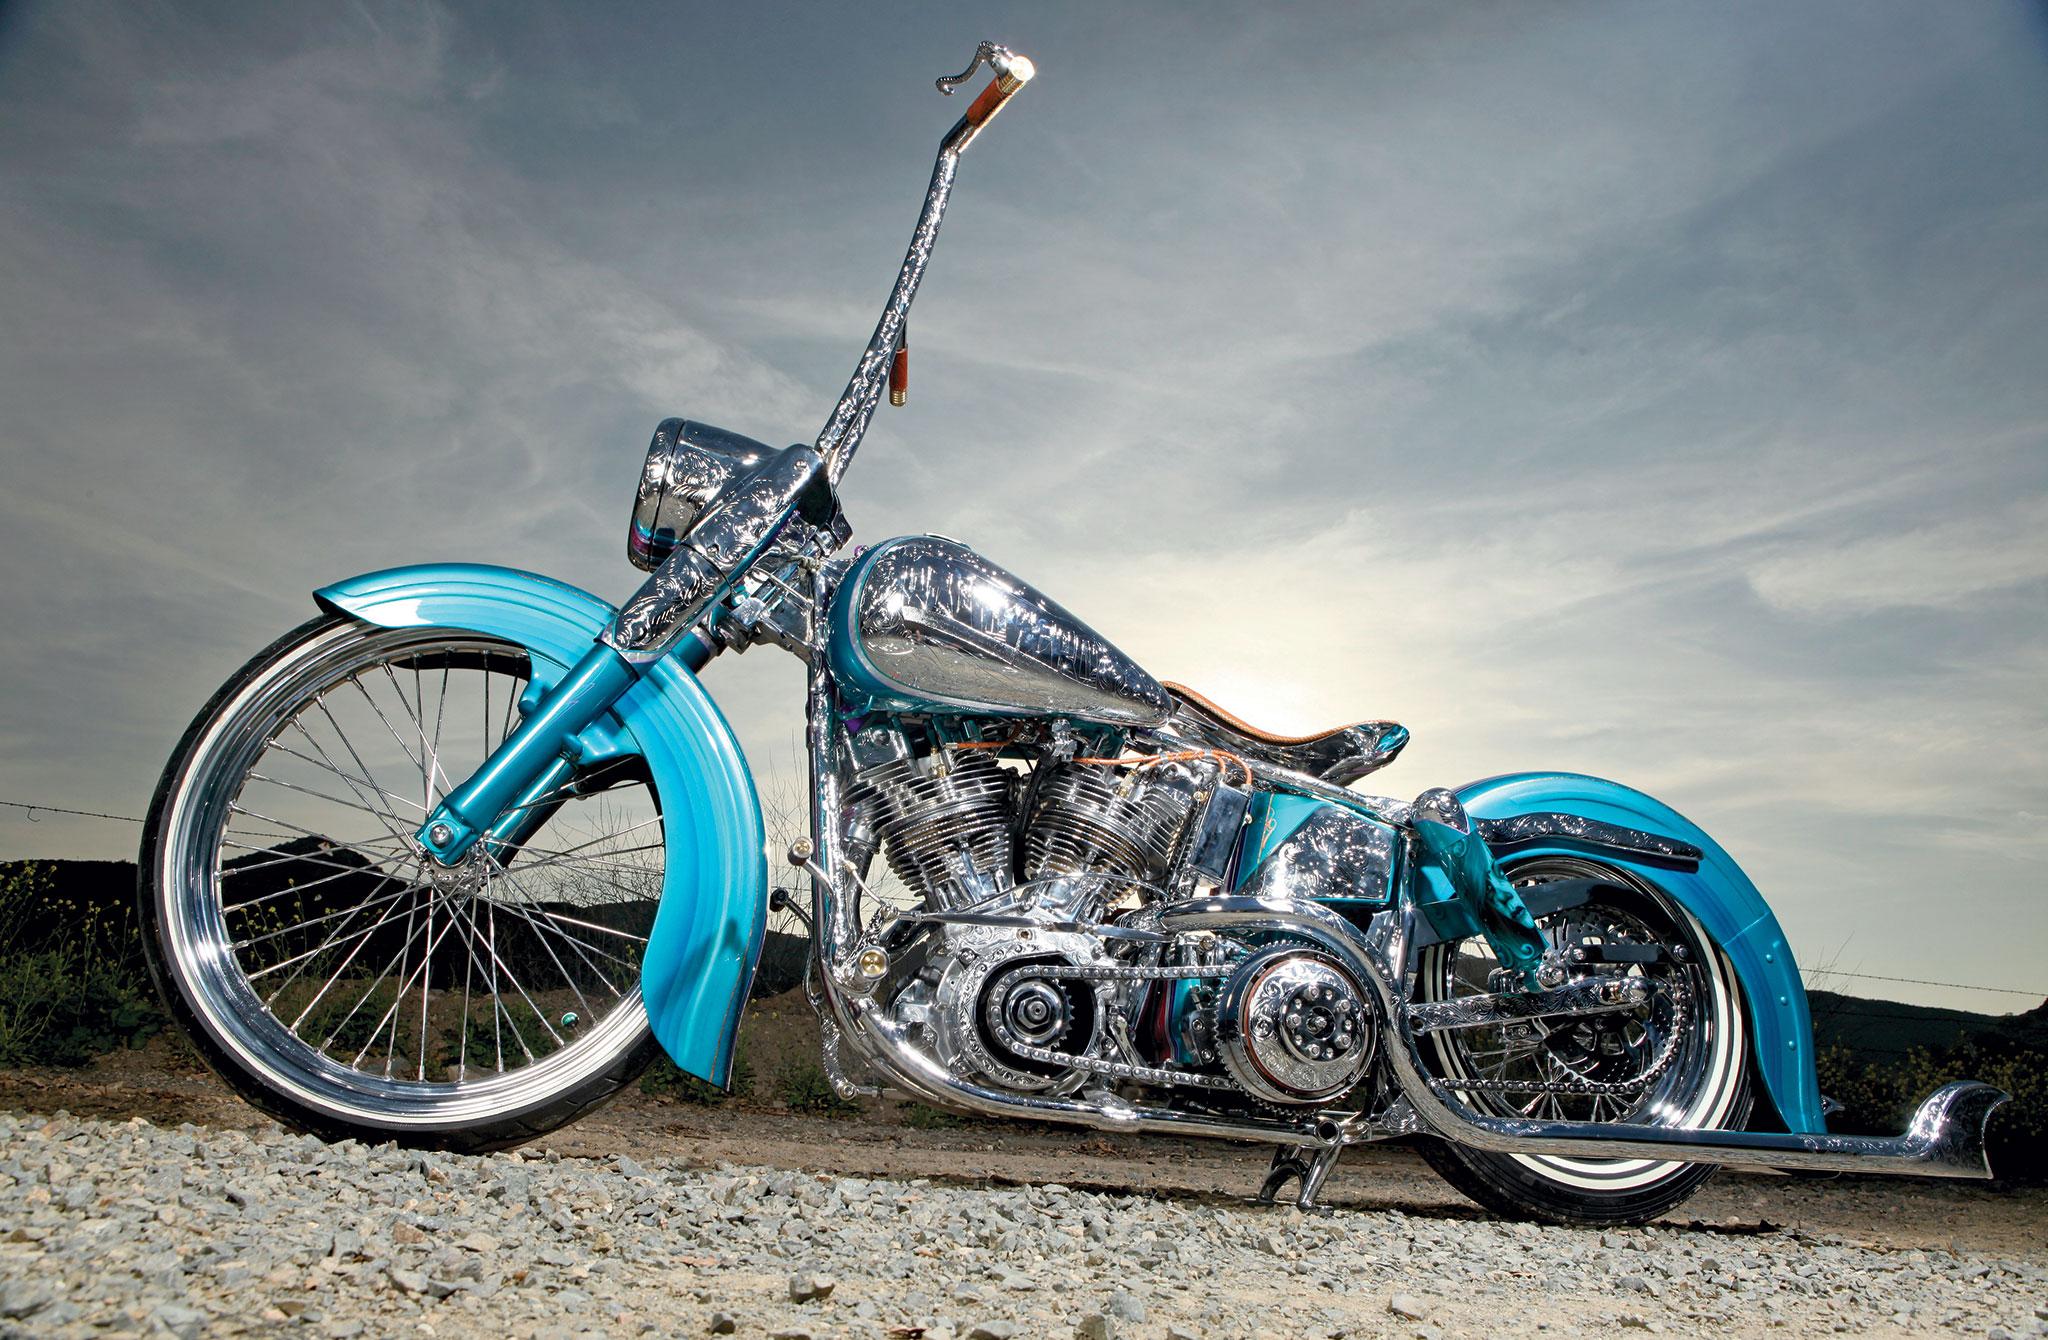 1974 Harley Davidson Shovelhead - Old's Cool - Lowrider